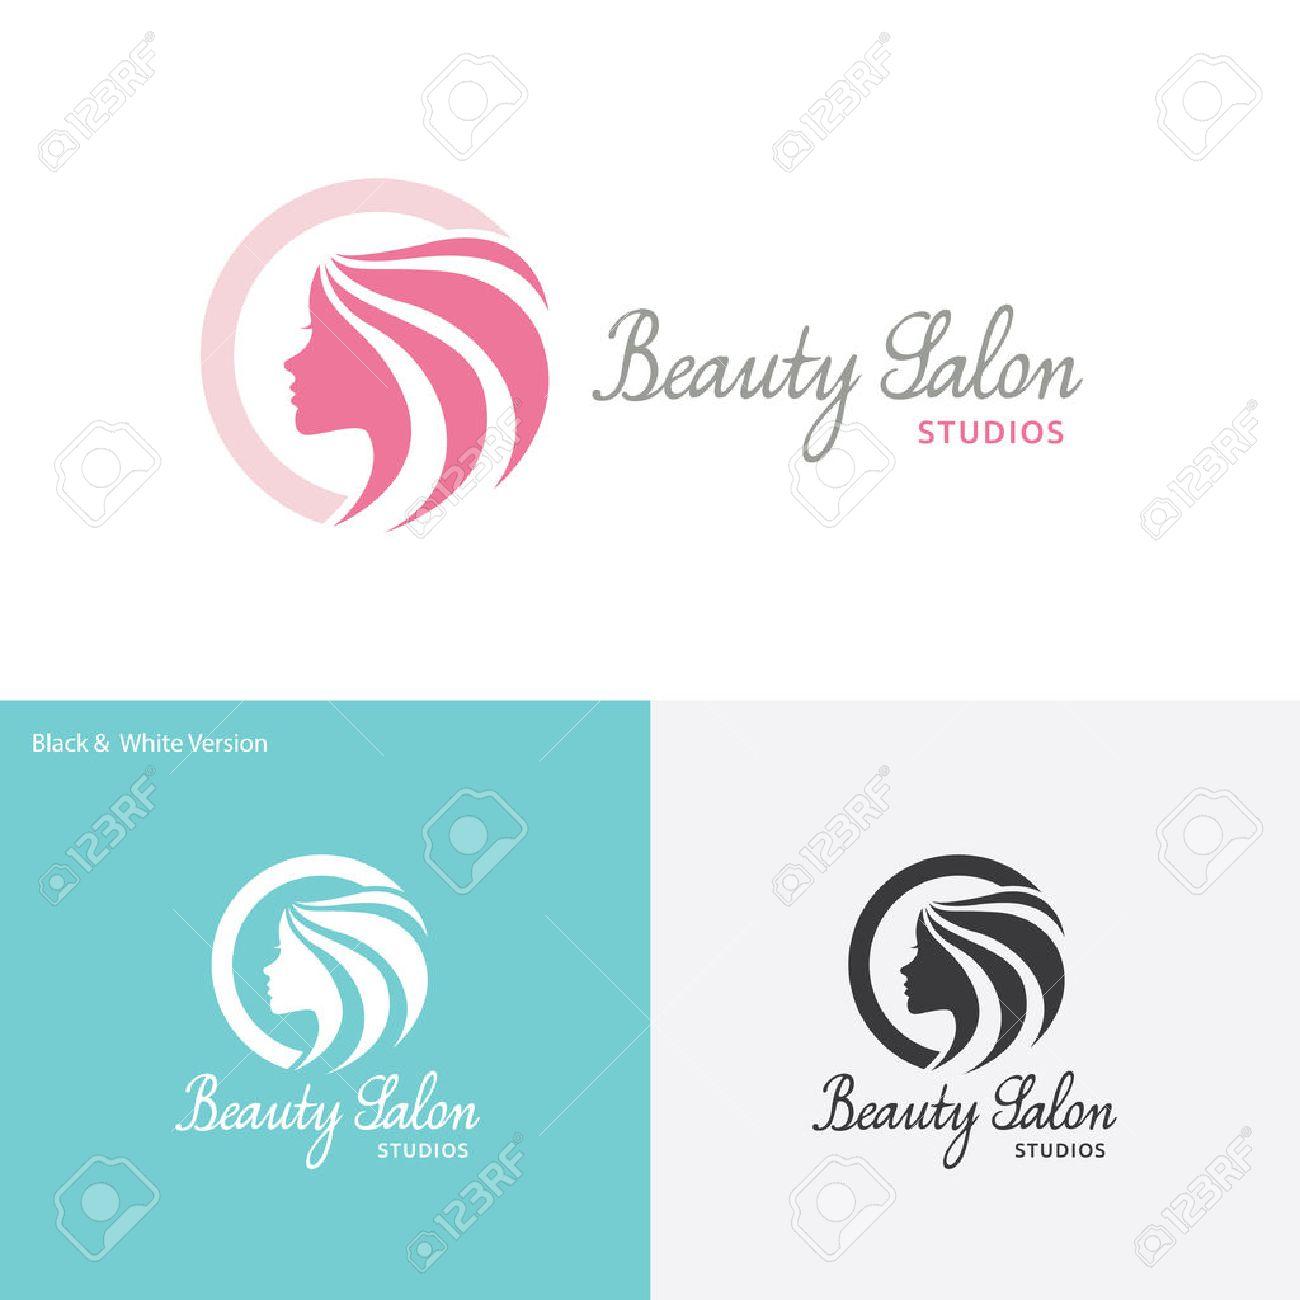 Beauty Care logo,Feminine Logo,beauty salon logo,vector logo template - 52550254